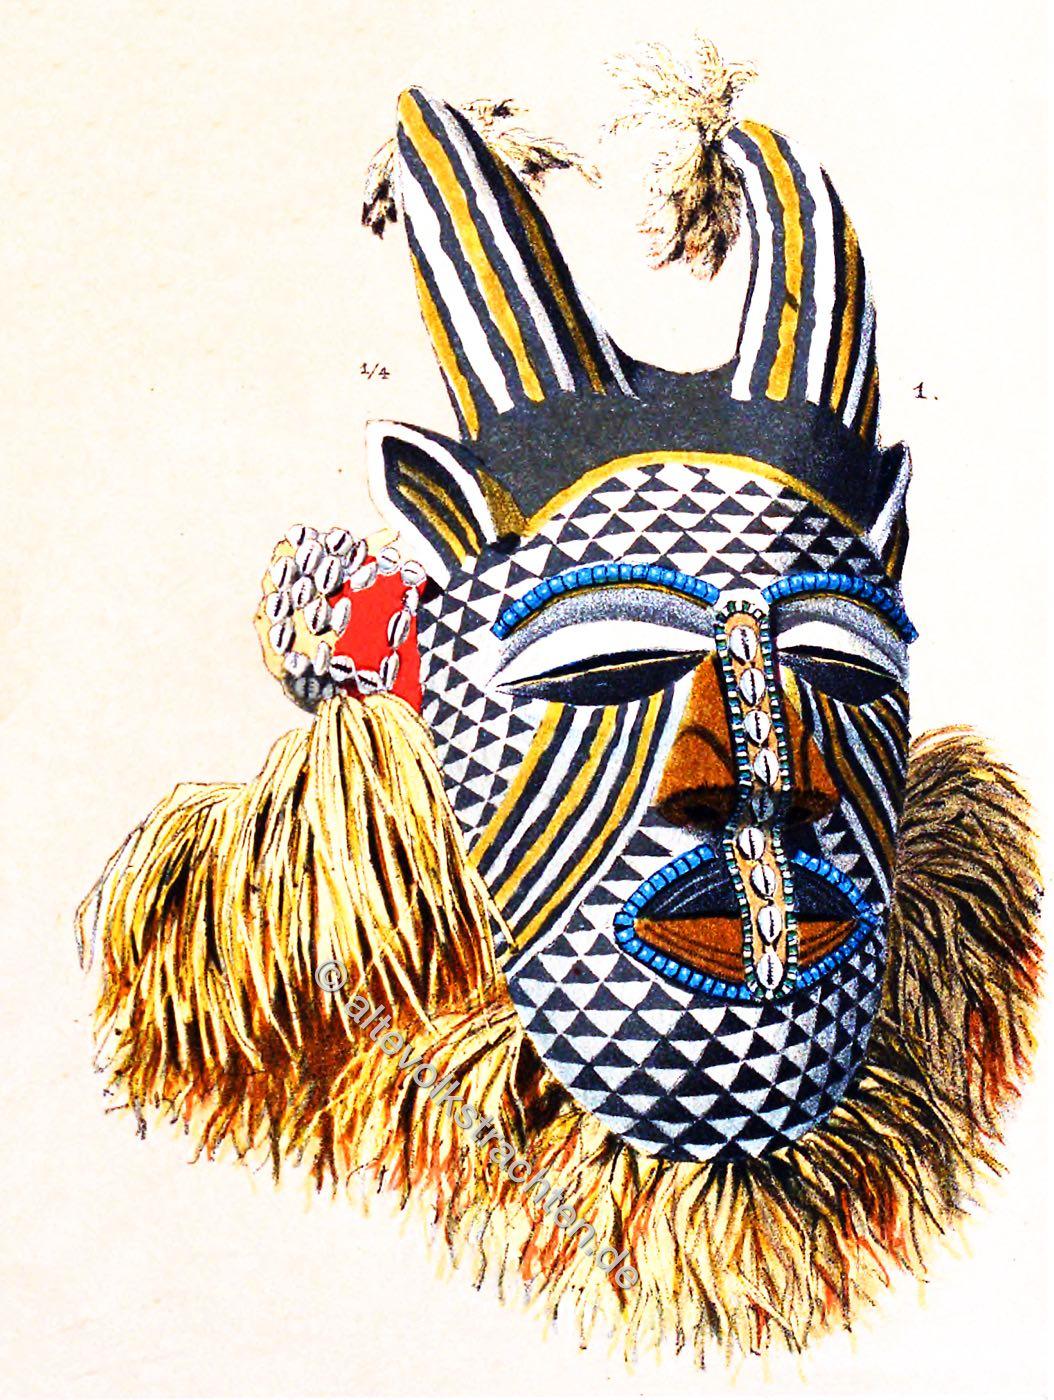 Maske, Sankuru-Fluss, Kongo, Afrika, Hörnermaske